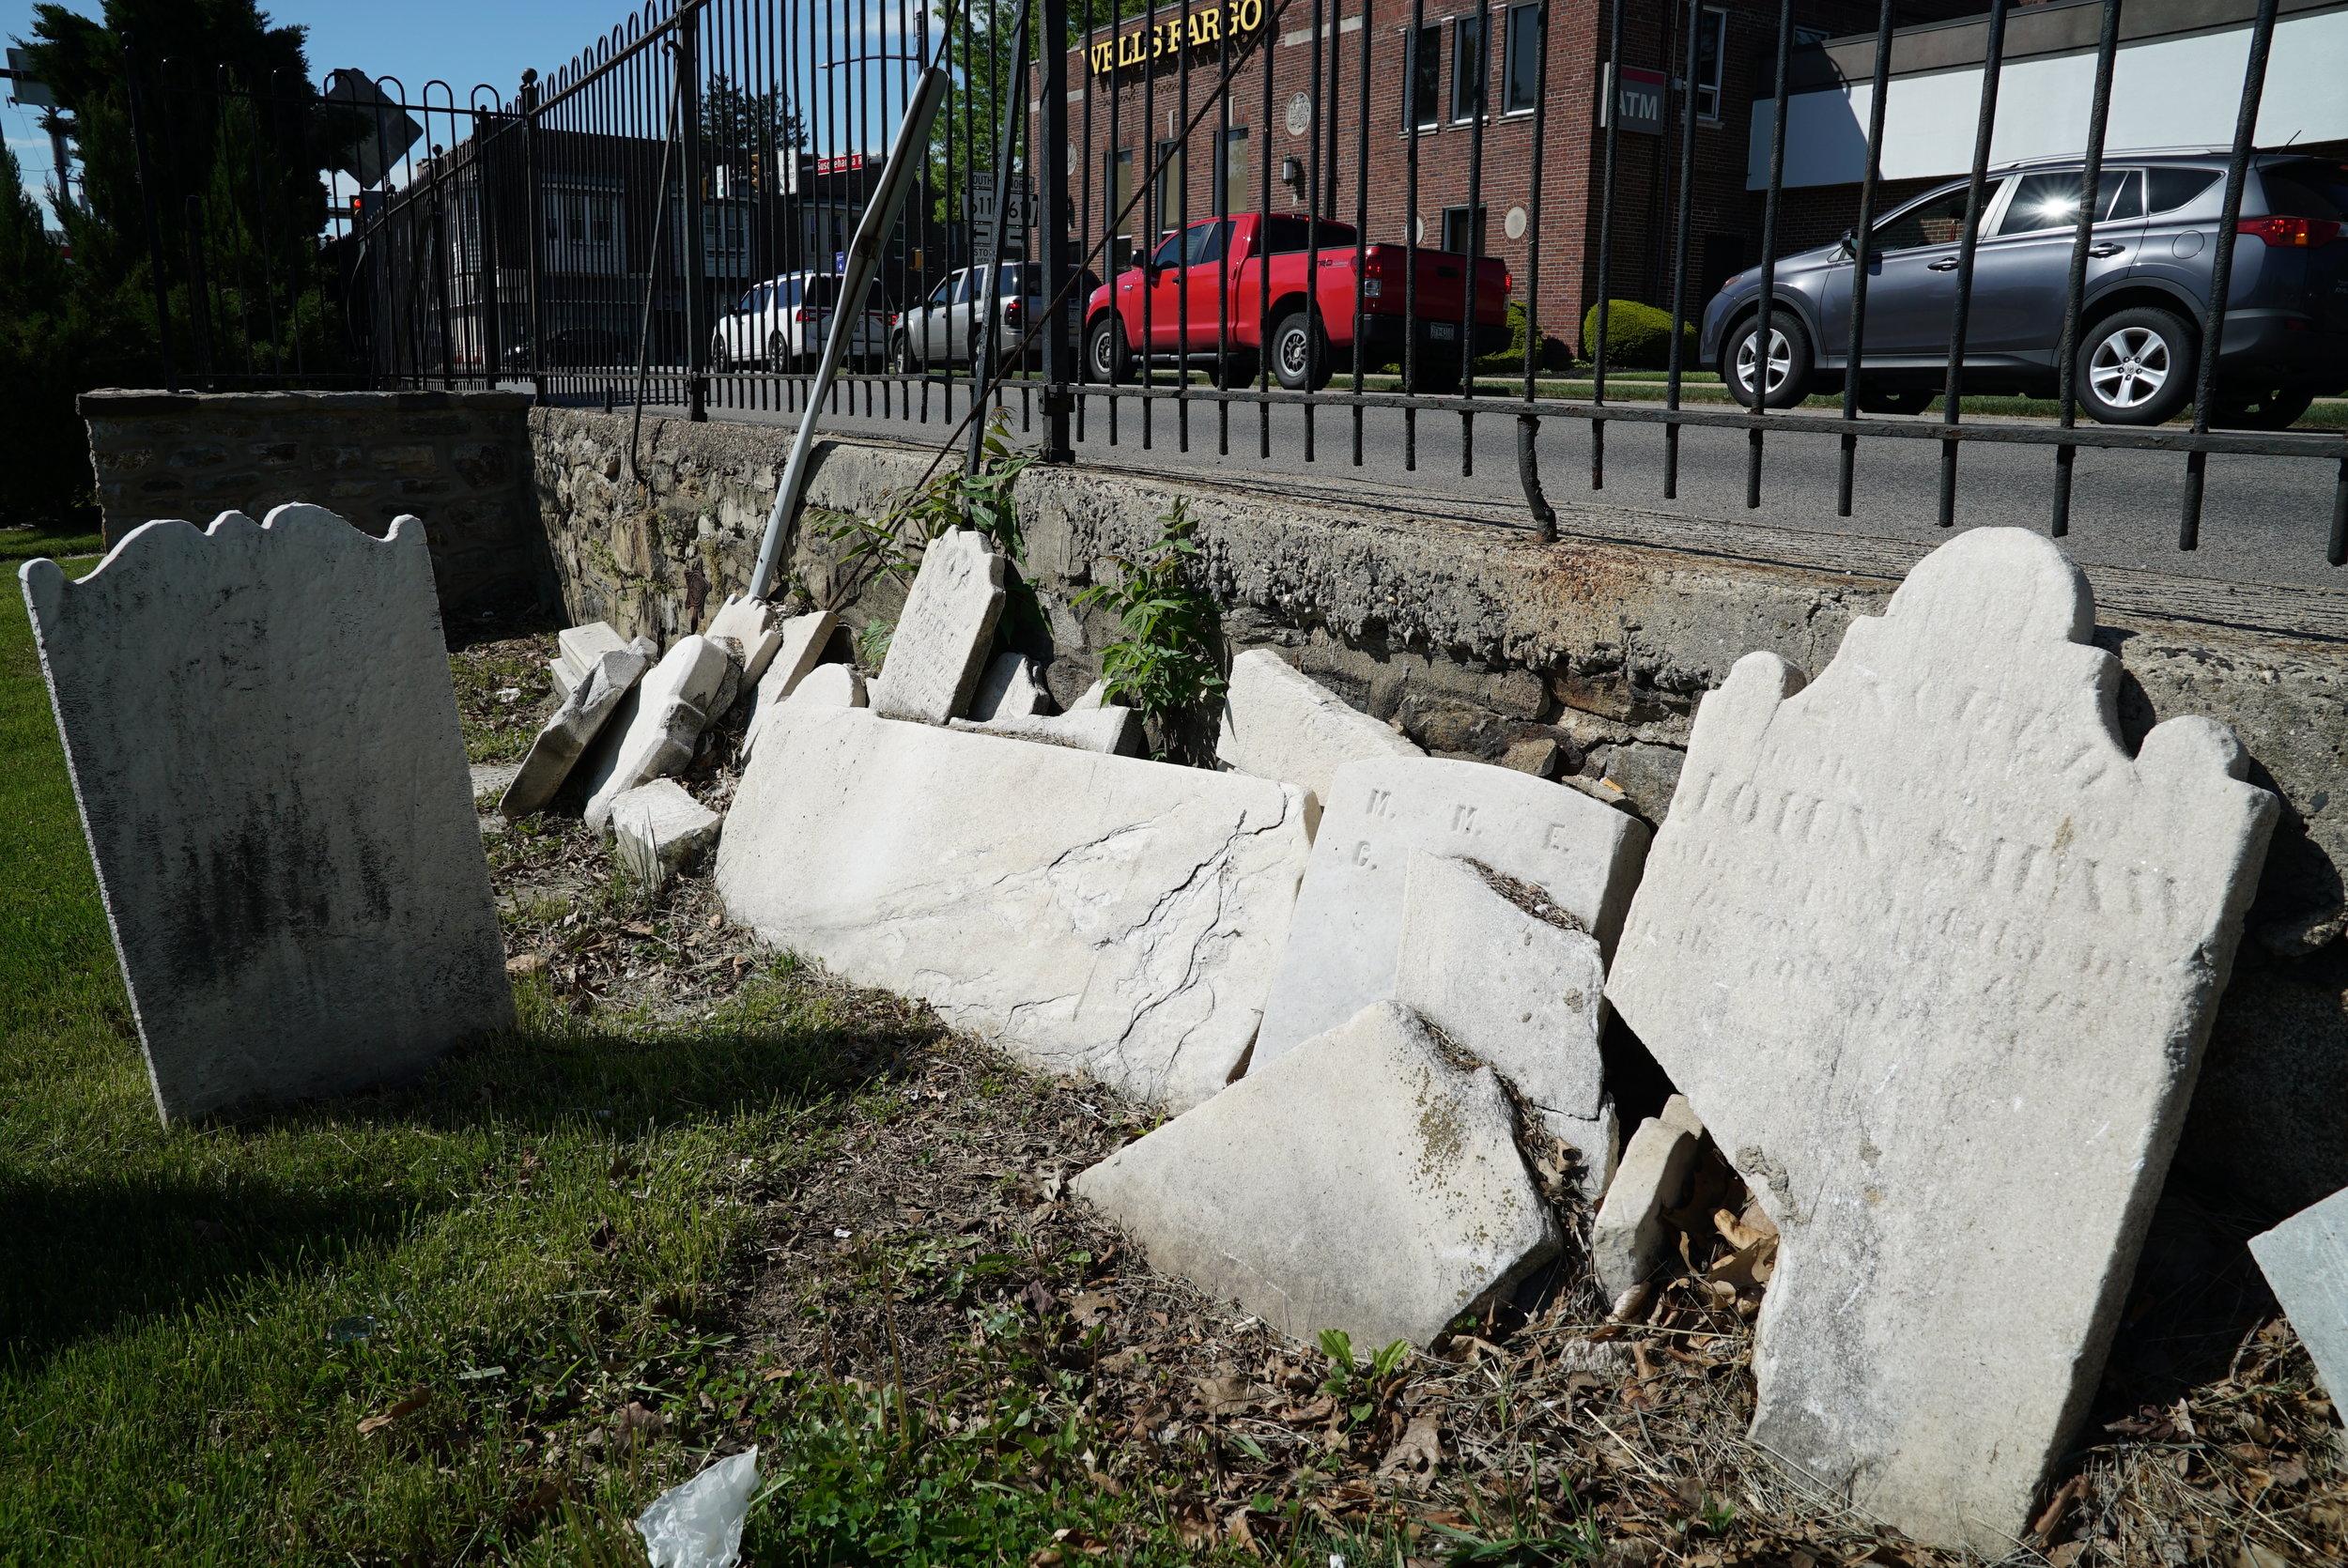 Ancient broken tombstones, set to the side. Abington Presbyterian Church Cemetery. Montgomery County, Pennsylvania.